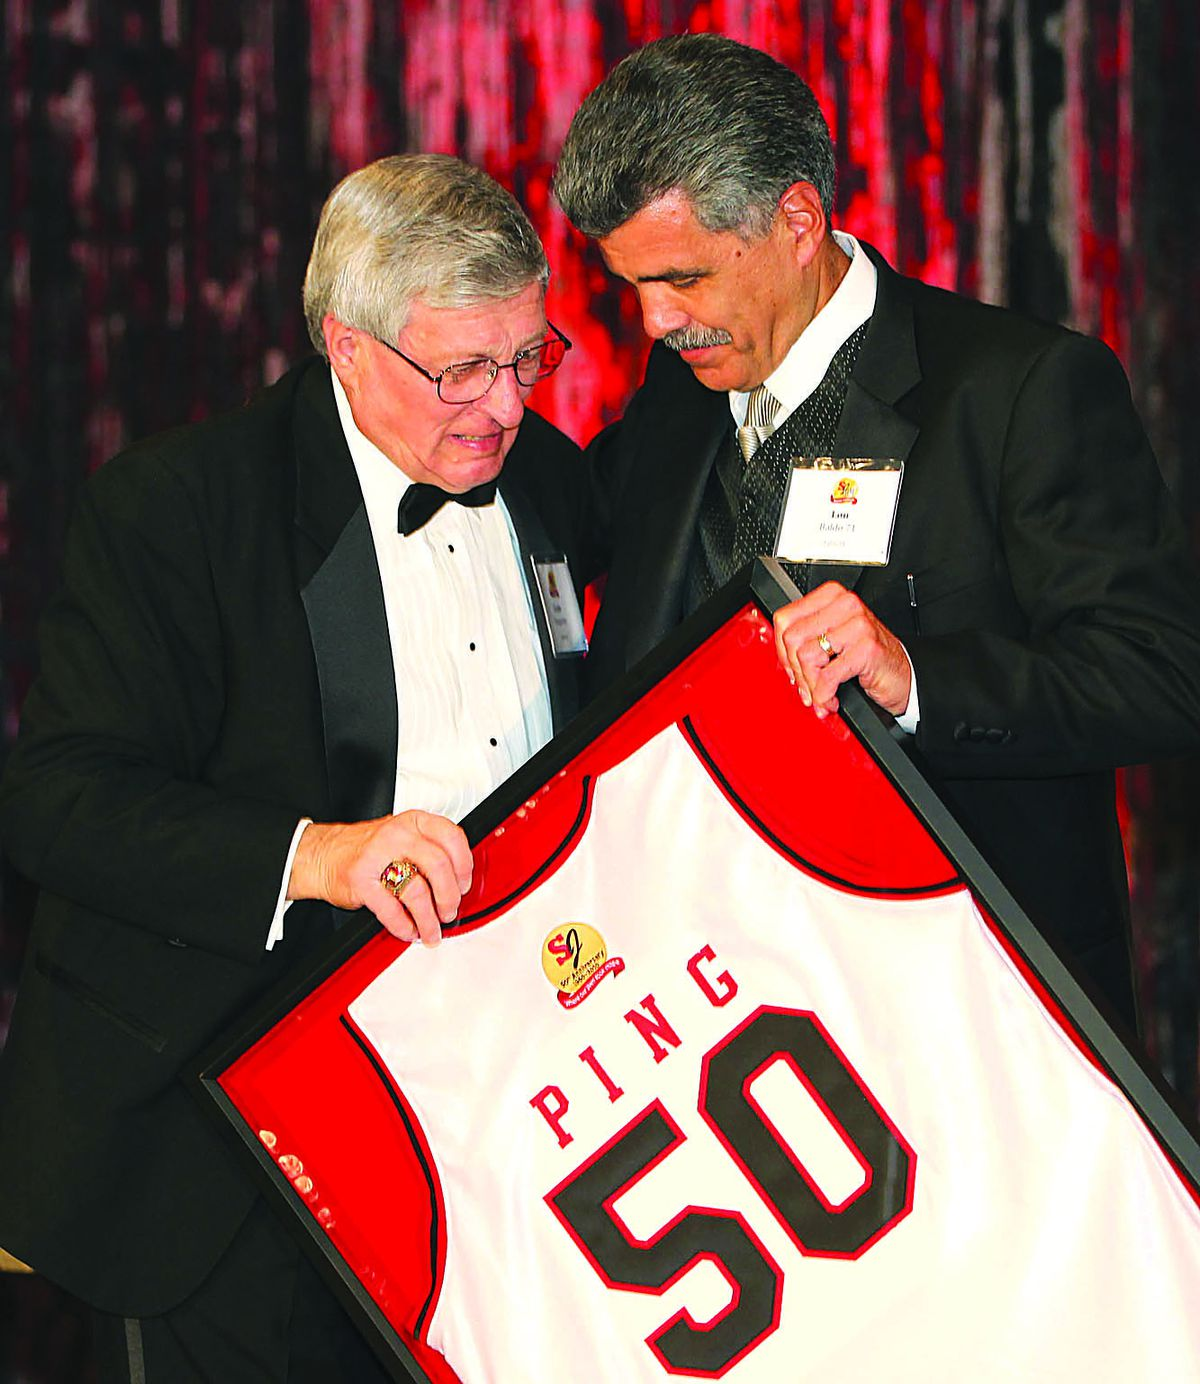 Lou Baldo presents a framed jersey to legendary basketball coach Gene Pigatore during the St. Joseph High School Golden Jubilee Gala.